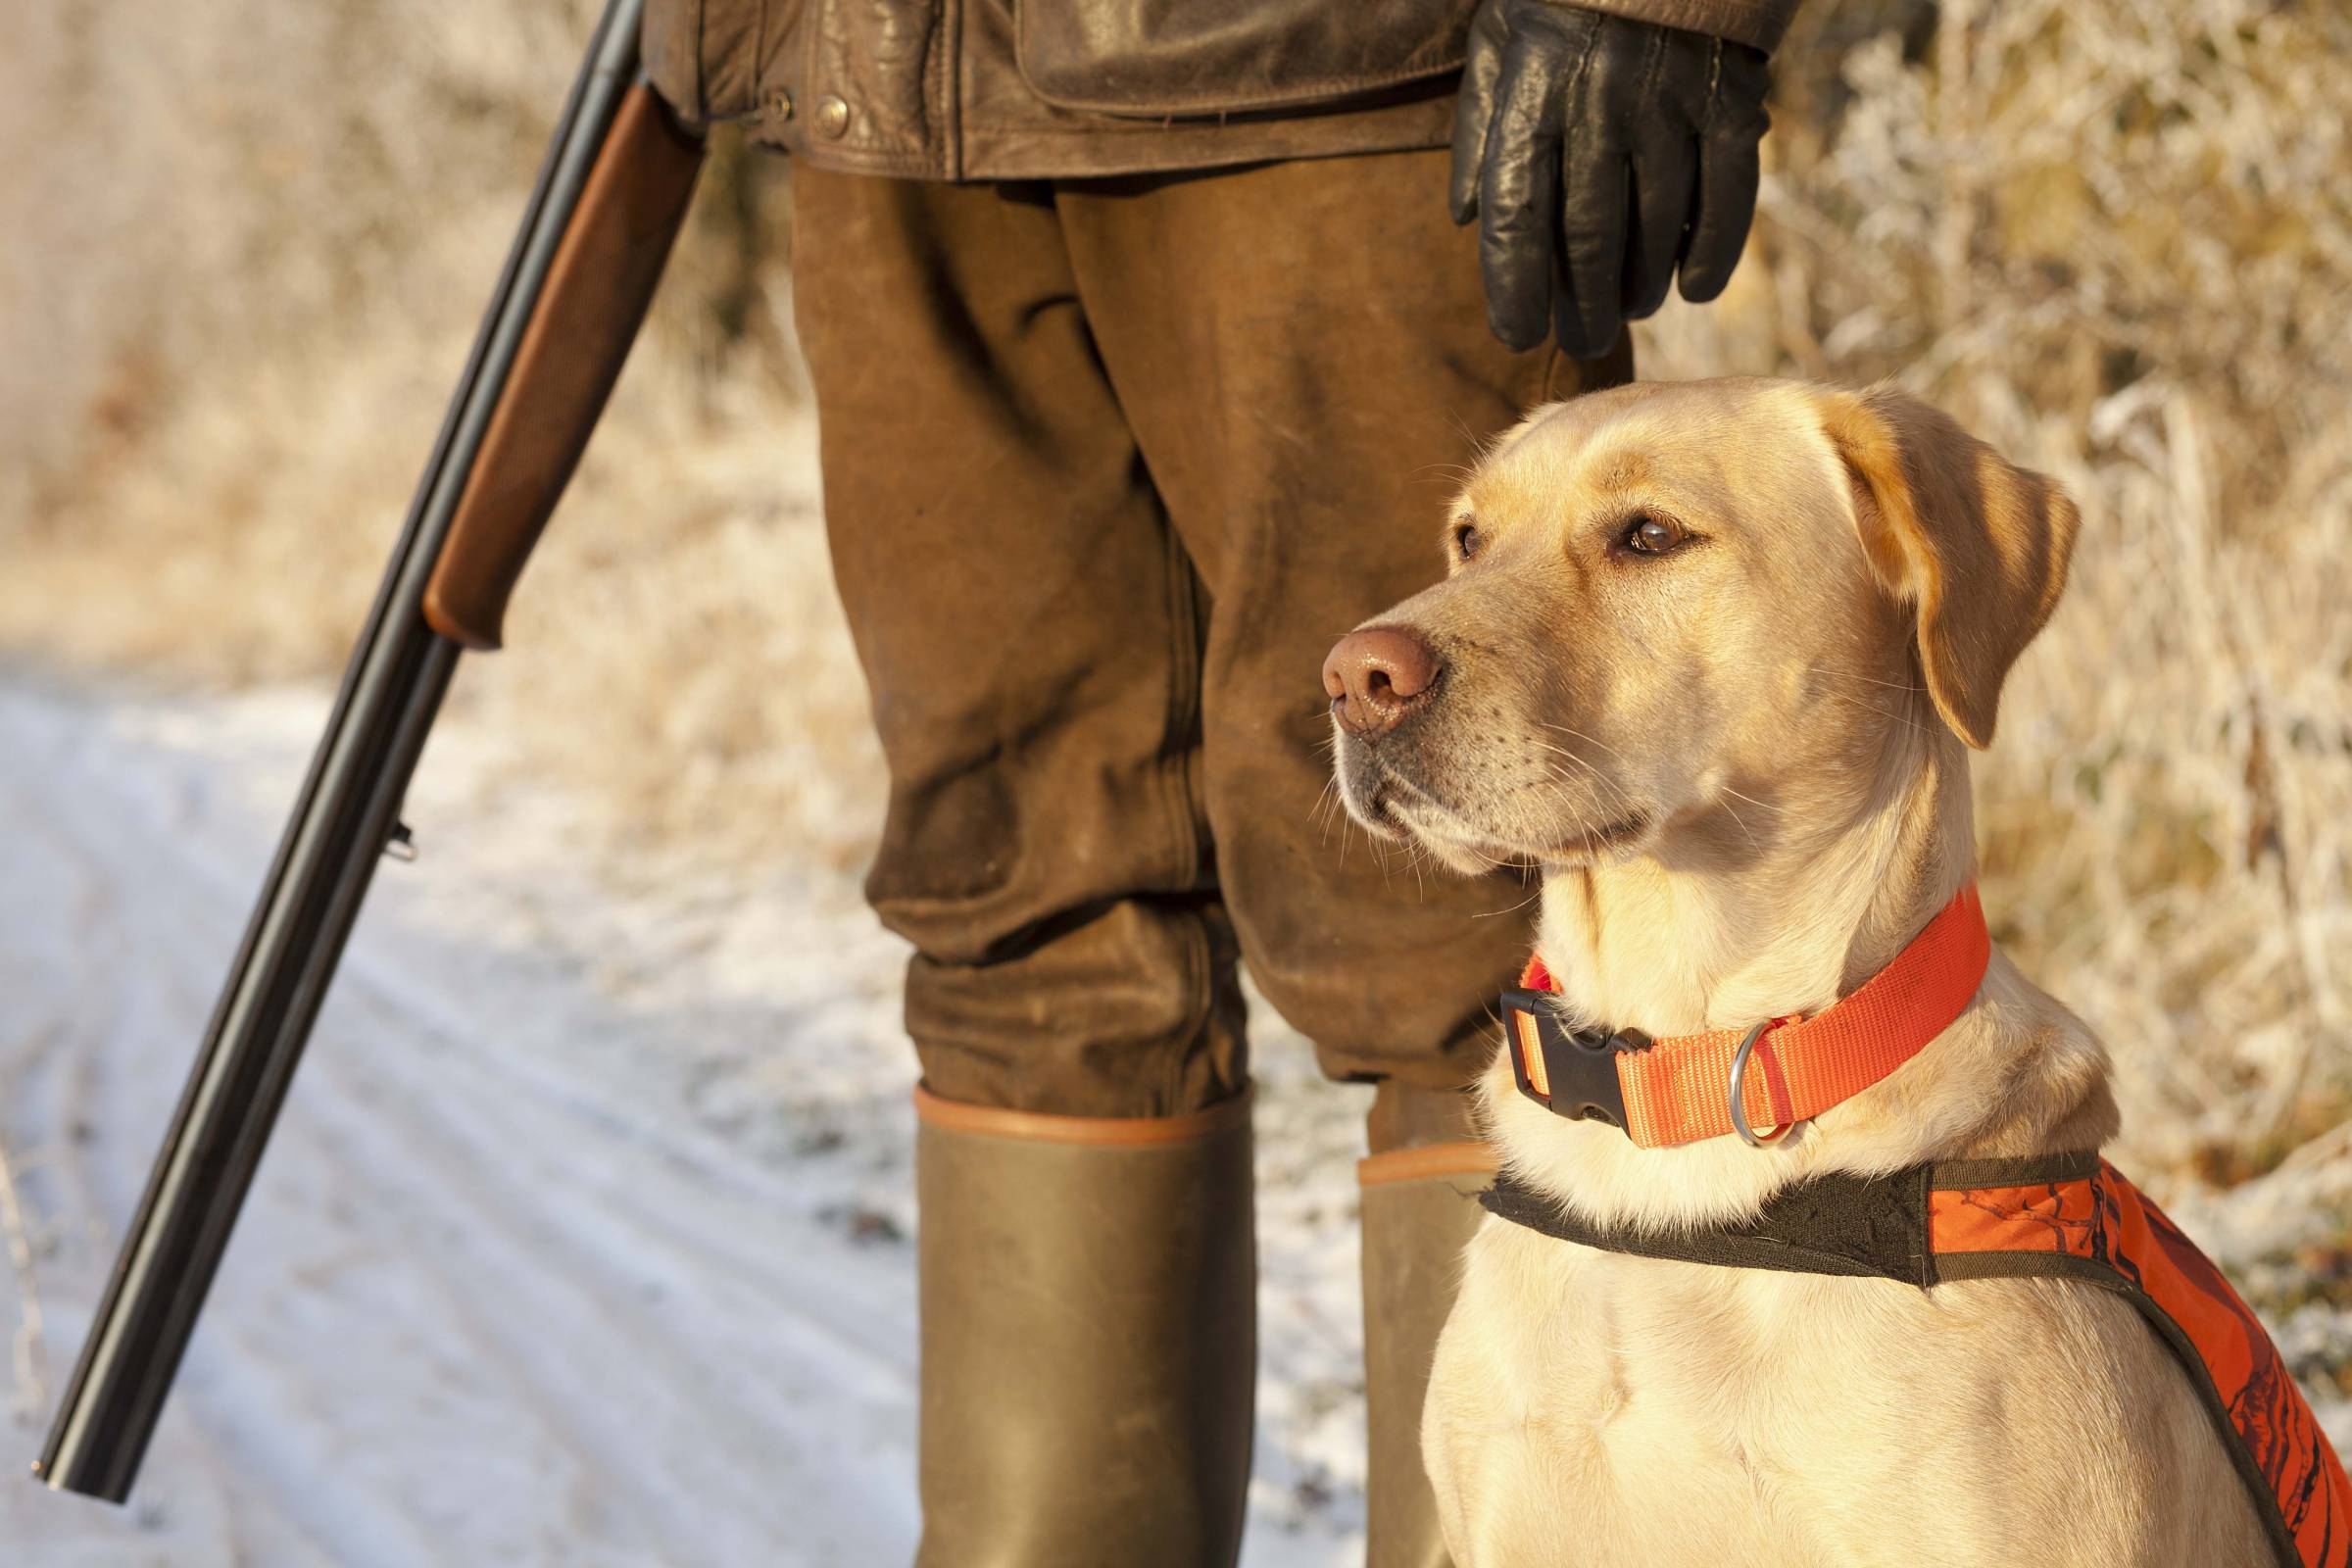 Hunter with Rifle standing next to yellow Labrador Dog